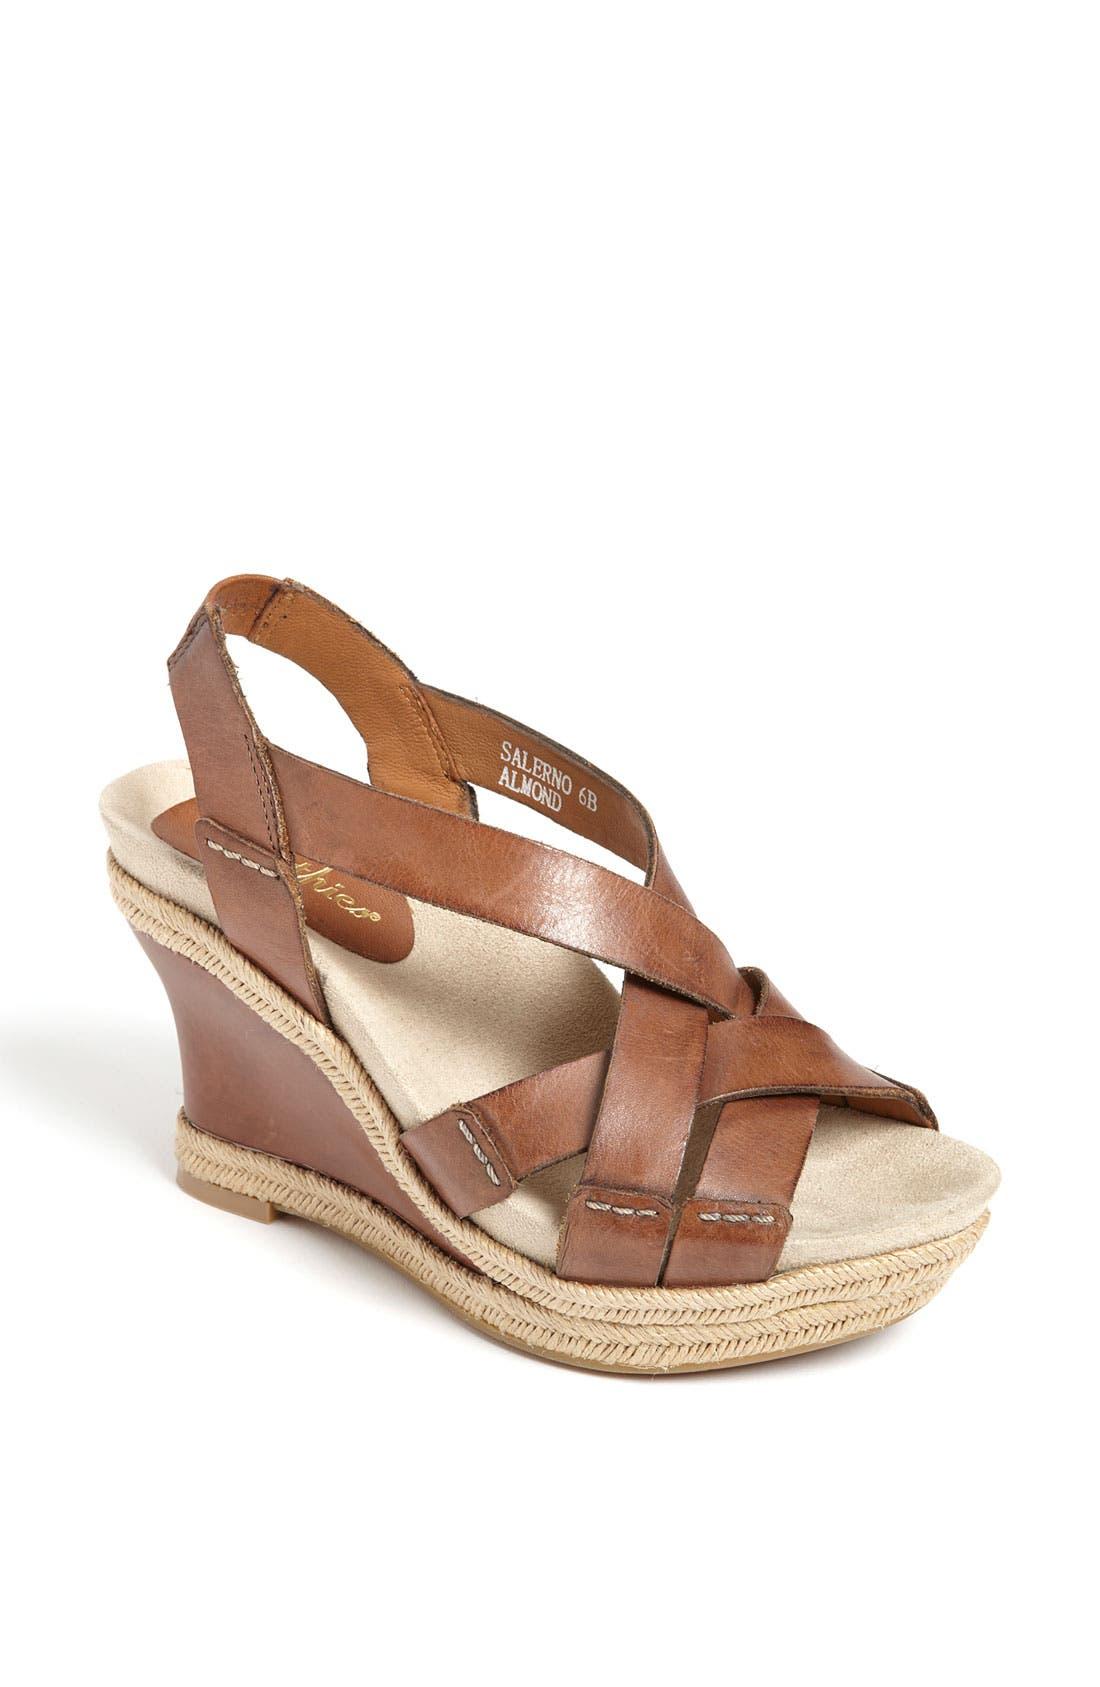 Alternate Image 1 Selected - Earthies® 'Salerno' Wedge Sandal